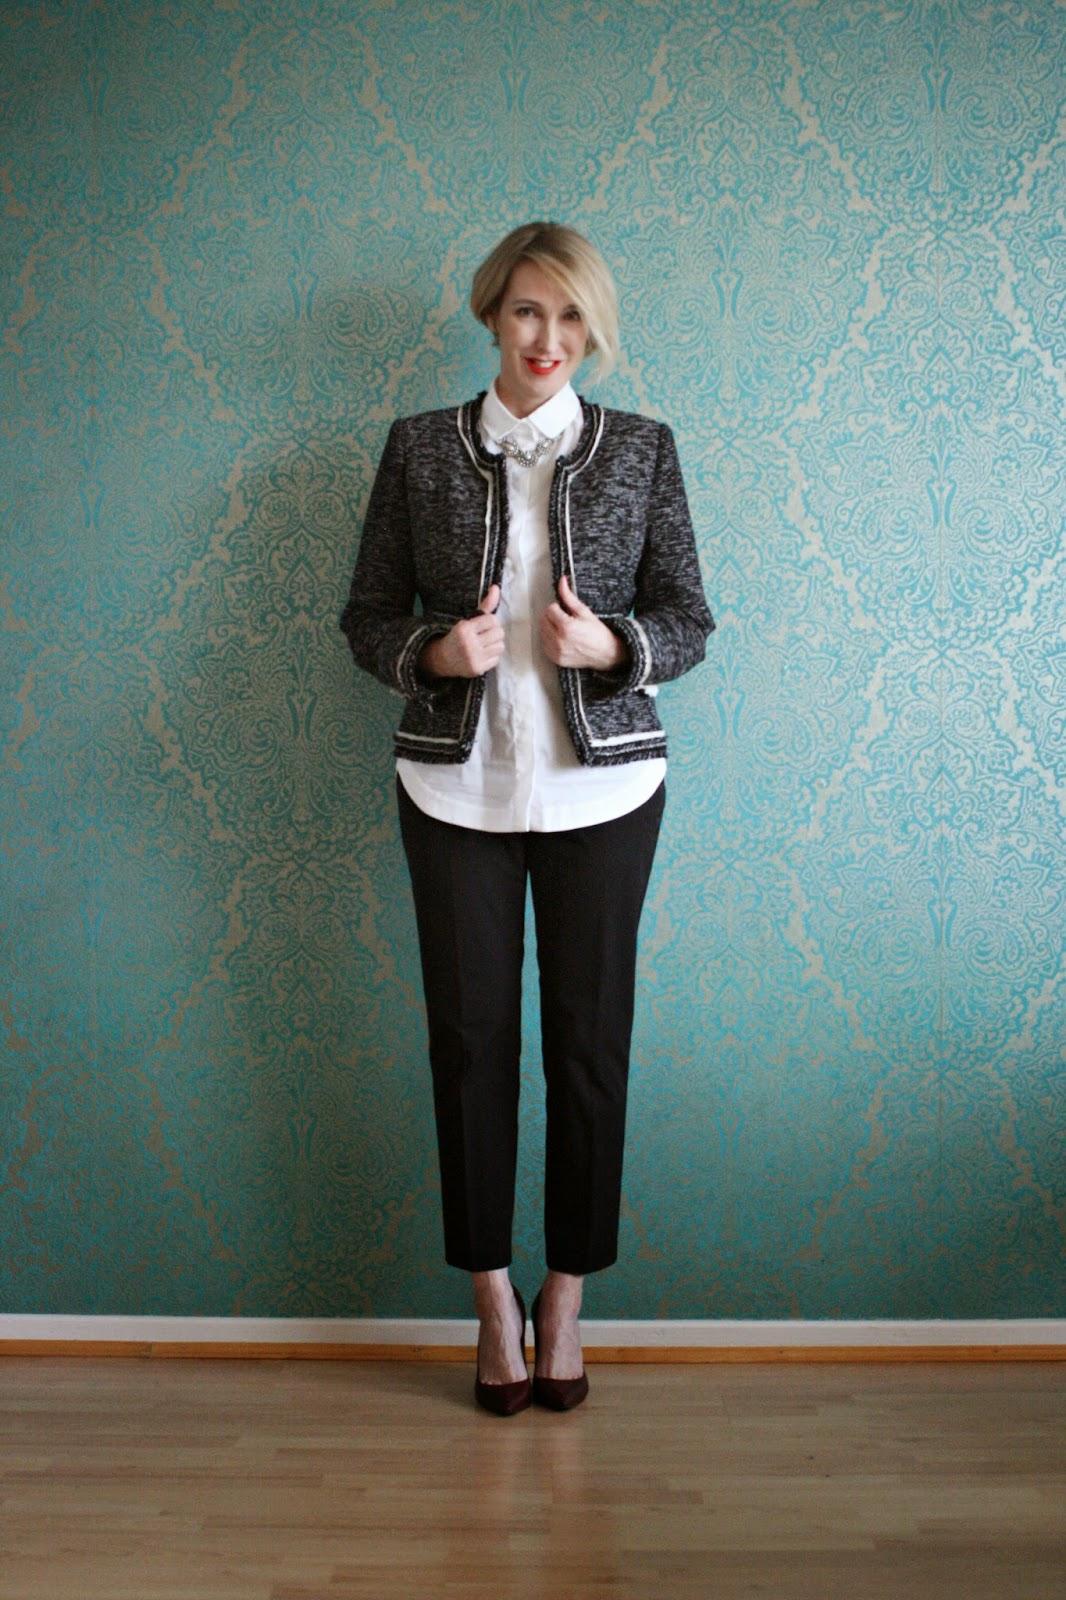 Capsule Wardrobe - Basis-Outfit für die Business-Garderobe 2.Teil